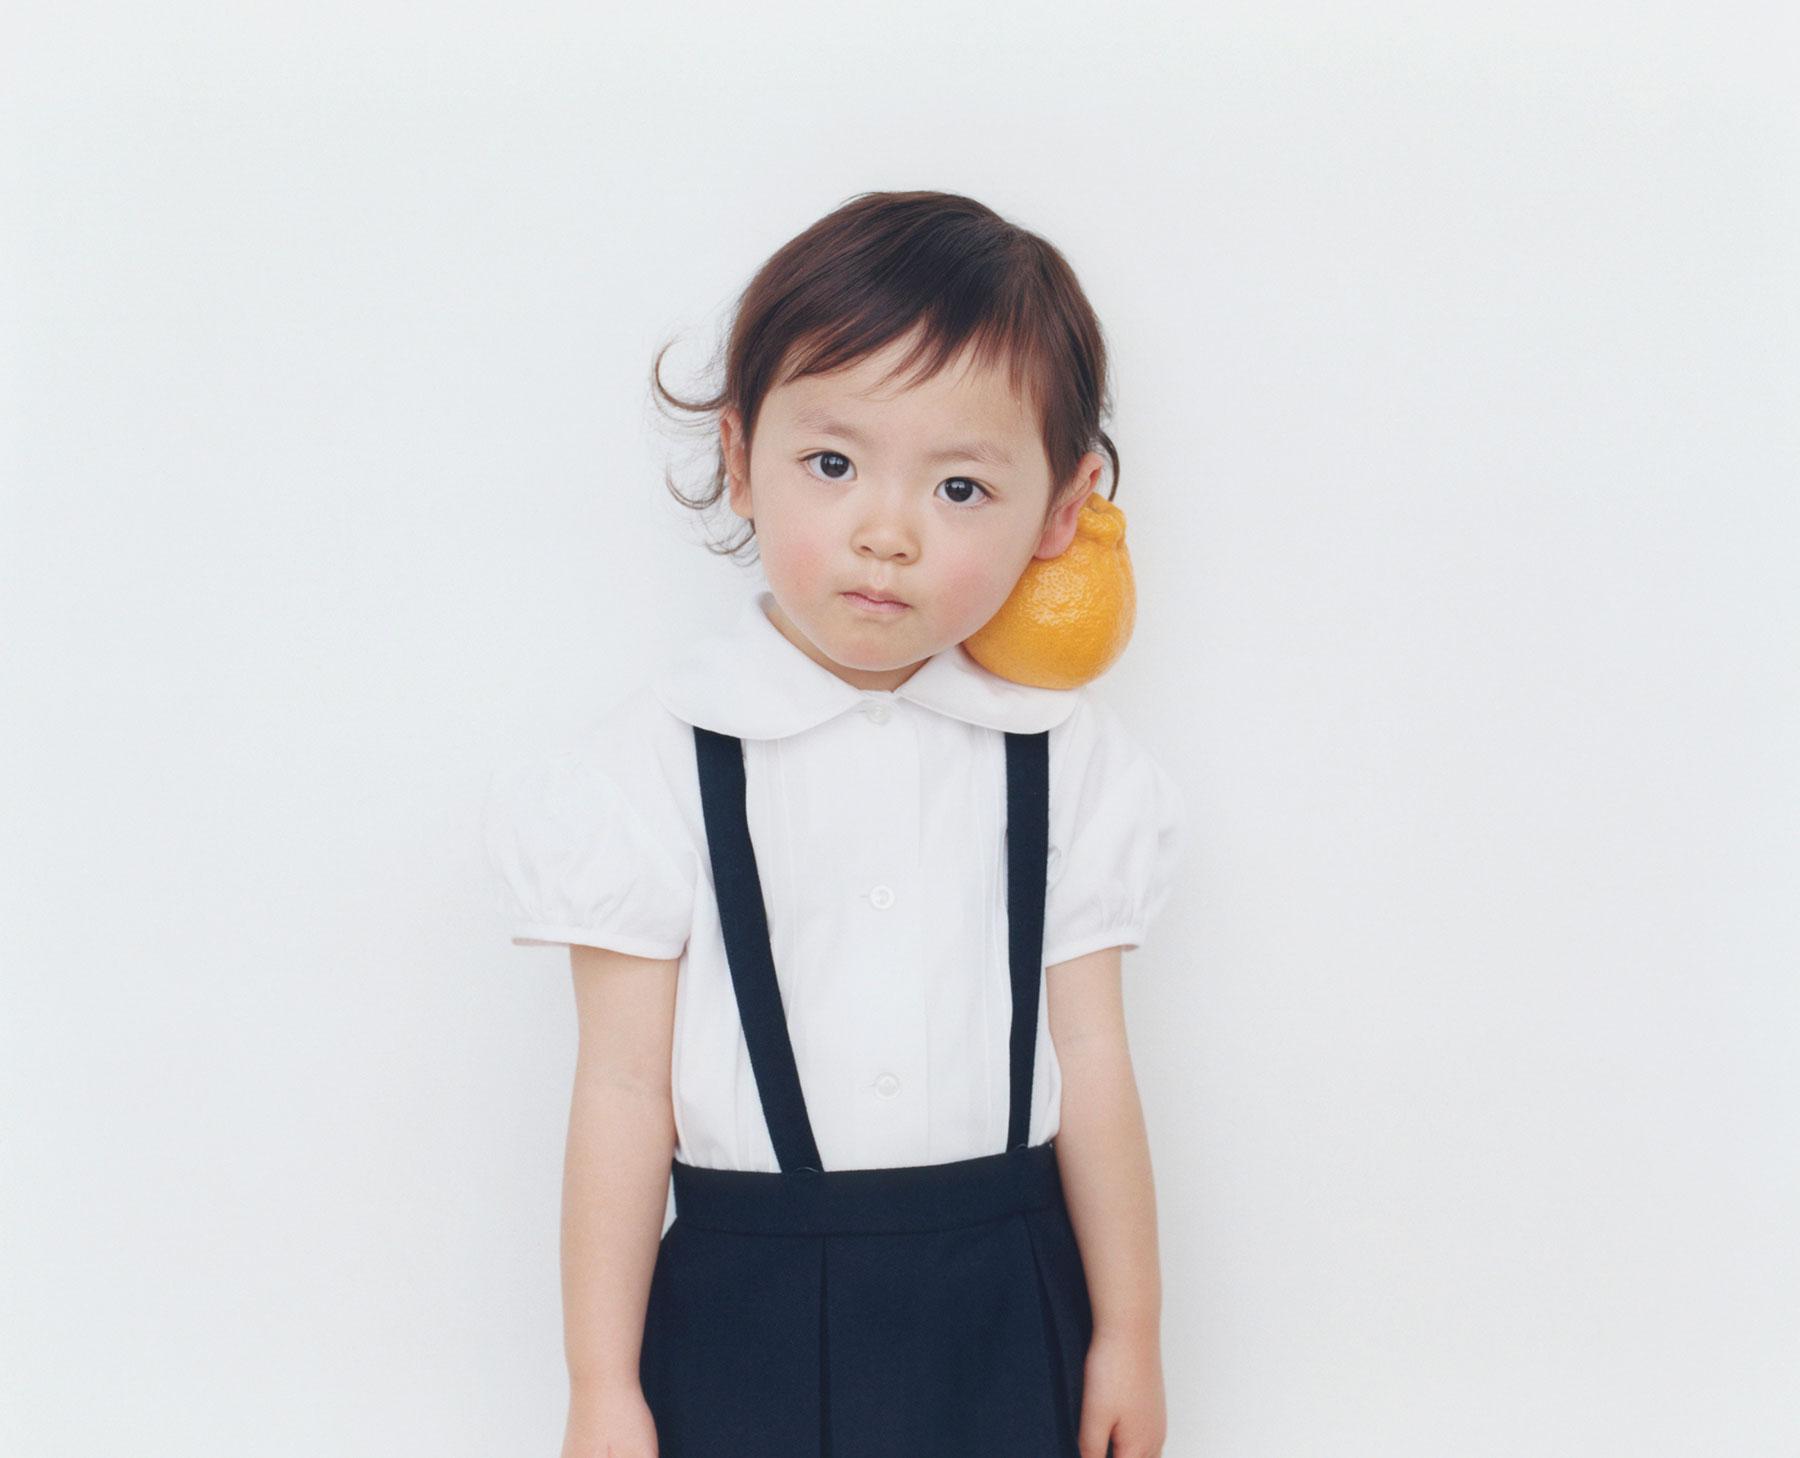 Osamu Yokonami,  1000 Children: Sumo Mandarin No. 23 , 2010-2013  Digital pigment print, 895 x 1105 mm (approx. 34.25 x 43.5 in), edition of 5; 146 x 168 mm (approx. 5.75 x 6.6 in), edition of 10   Inquire